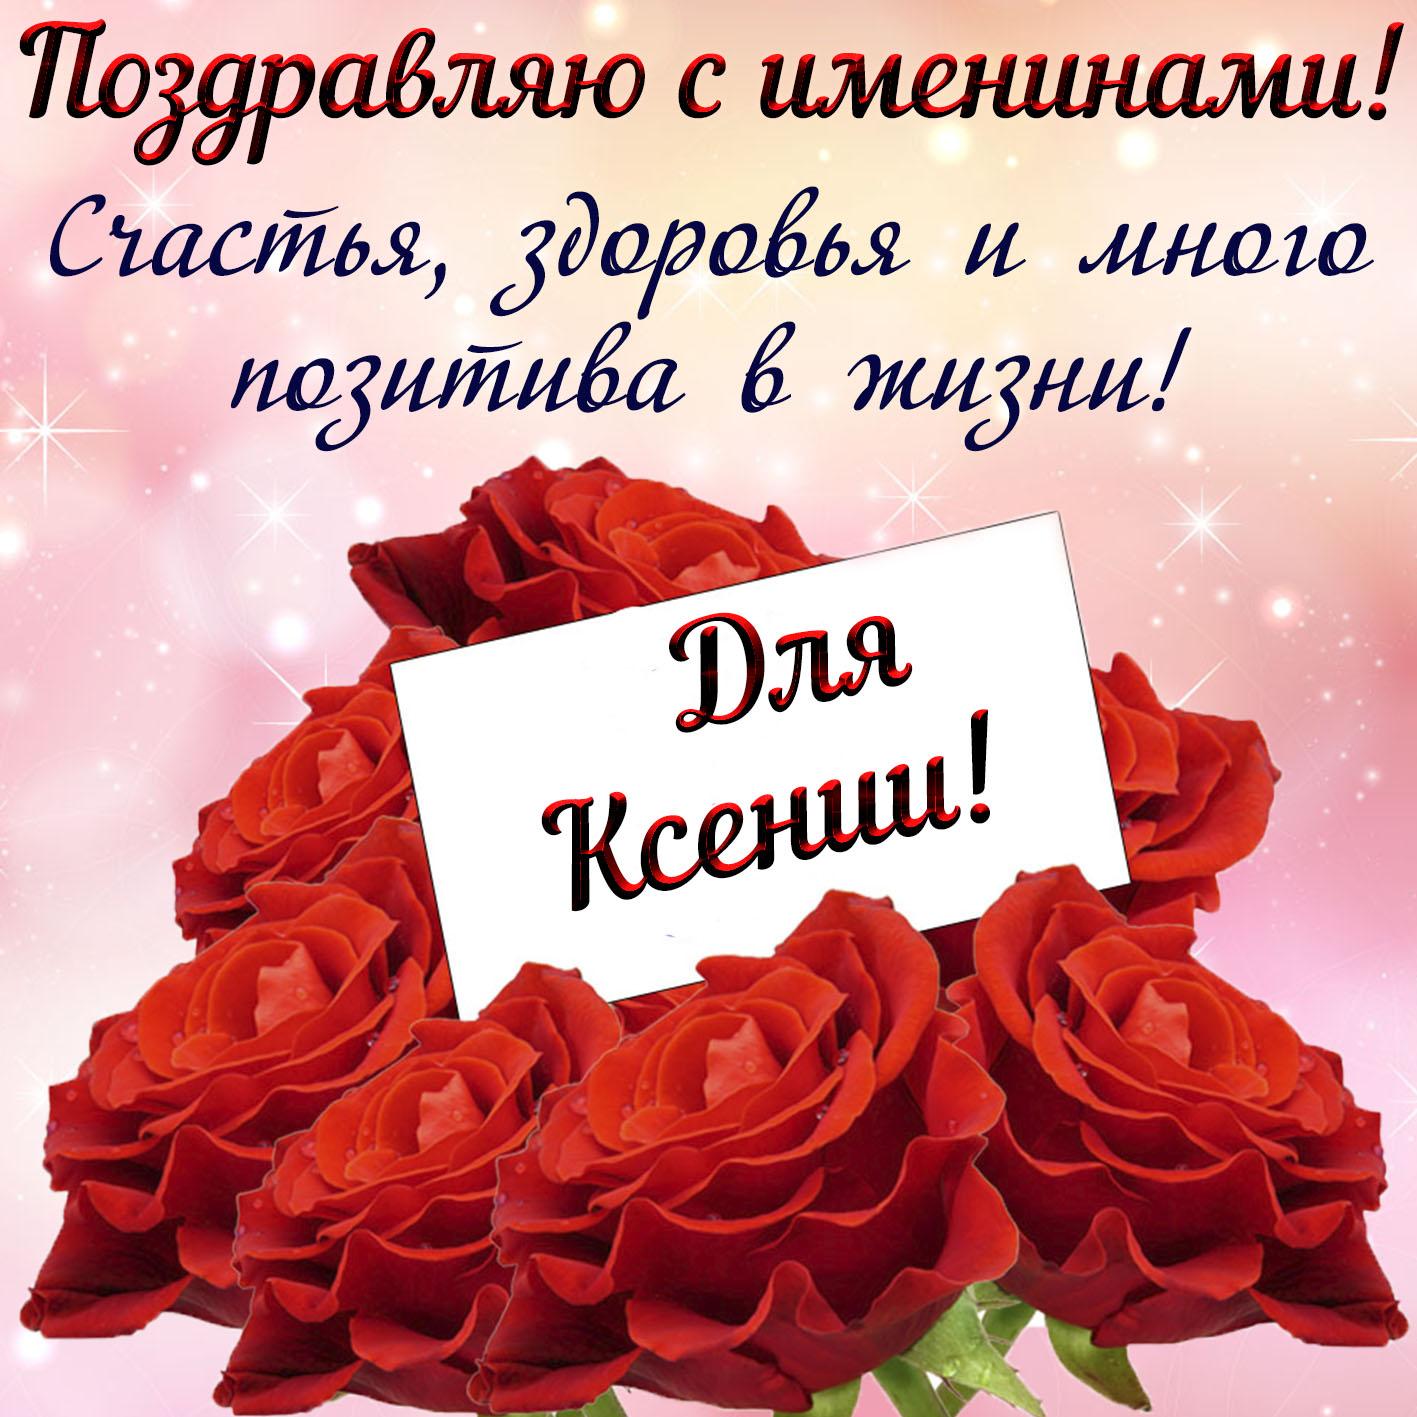 открытка цветы для ксюши жизни ахеджакова